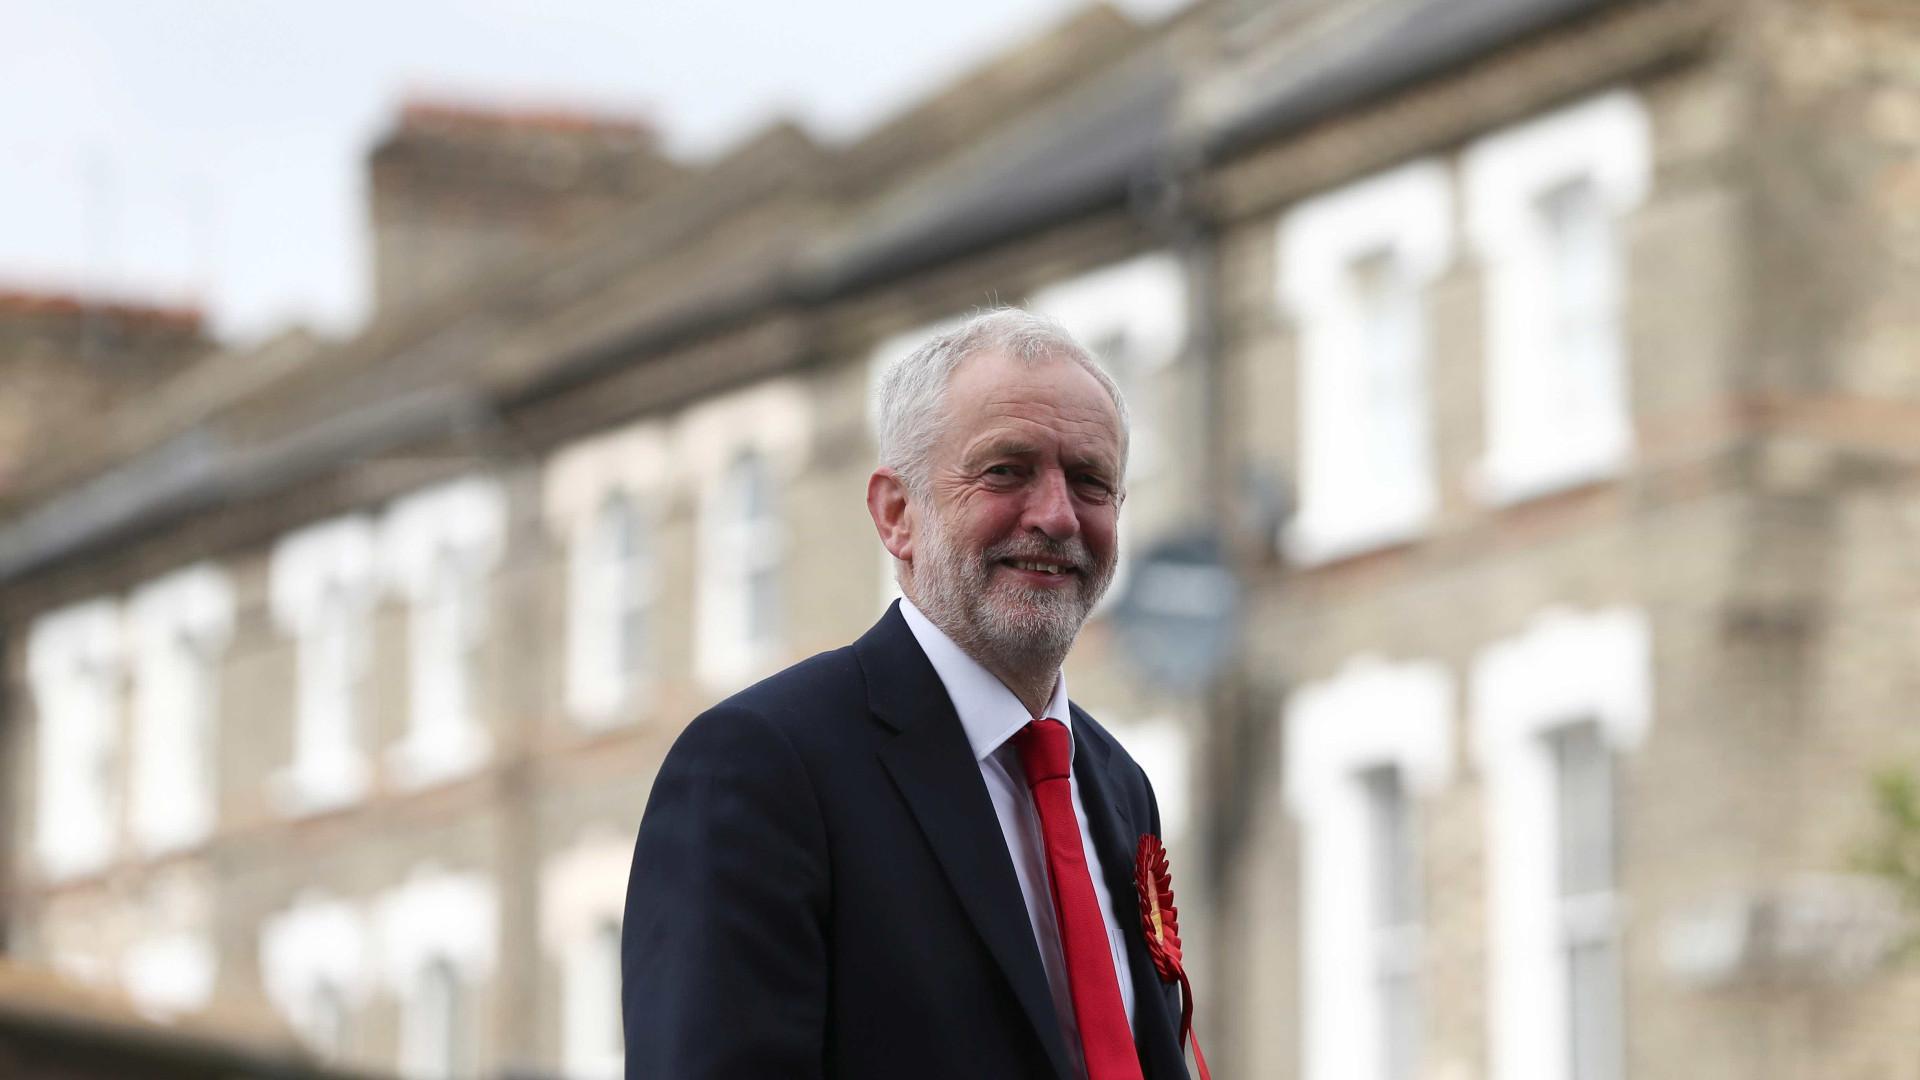 Jeremy Corbyn pede a demissão de Theresa May